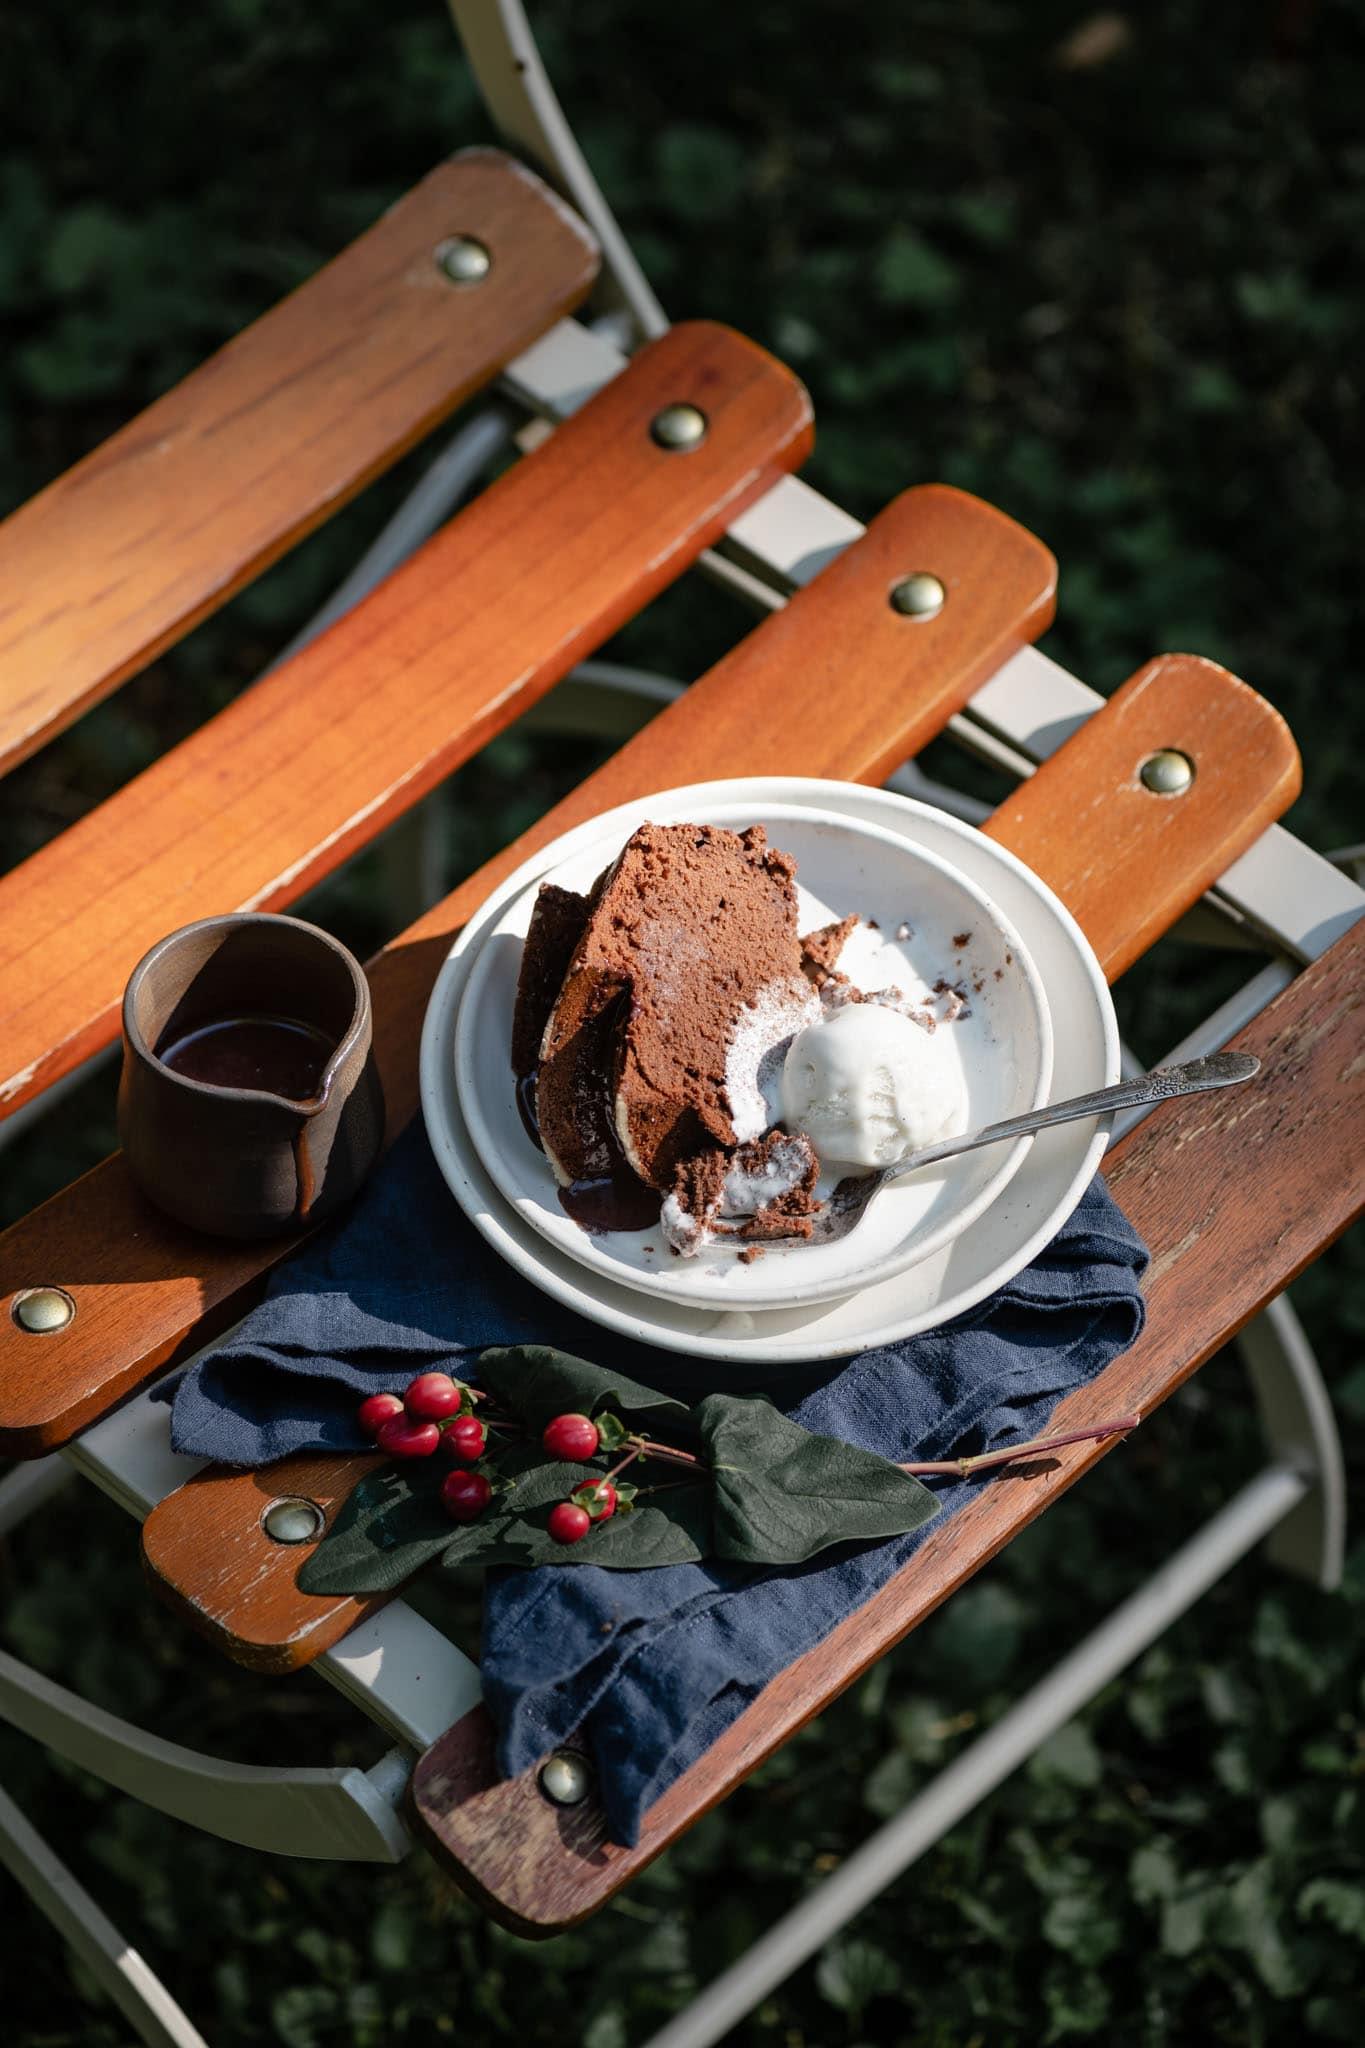 Chocolate cake served with ice cream.